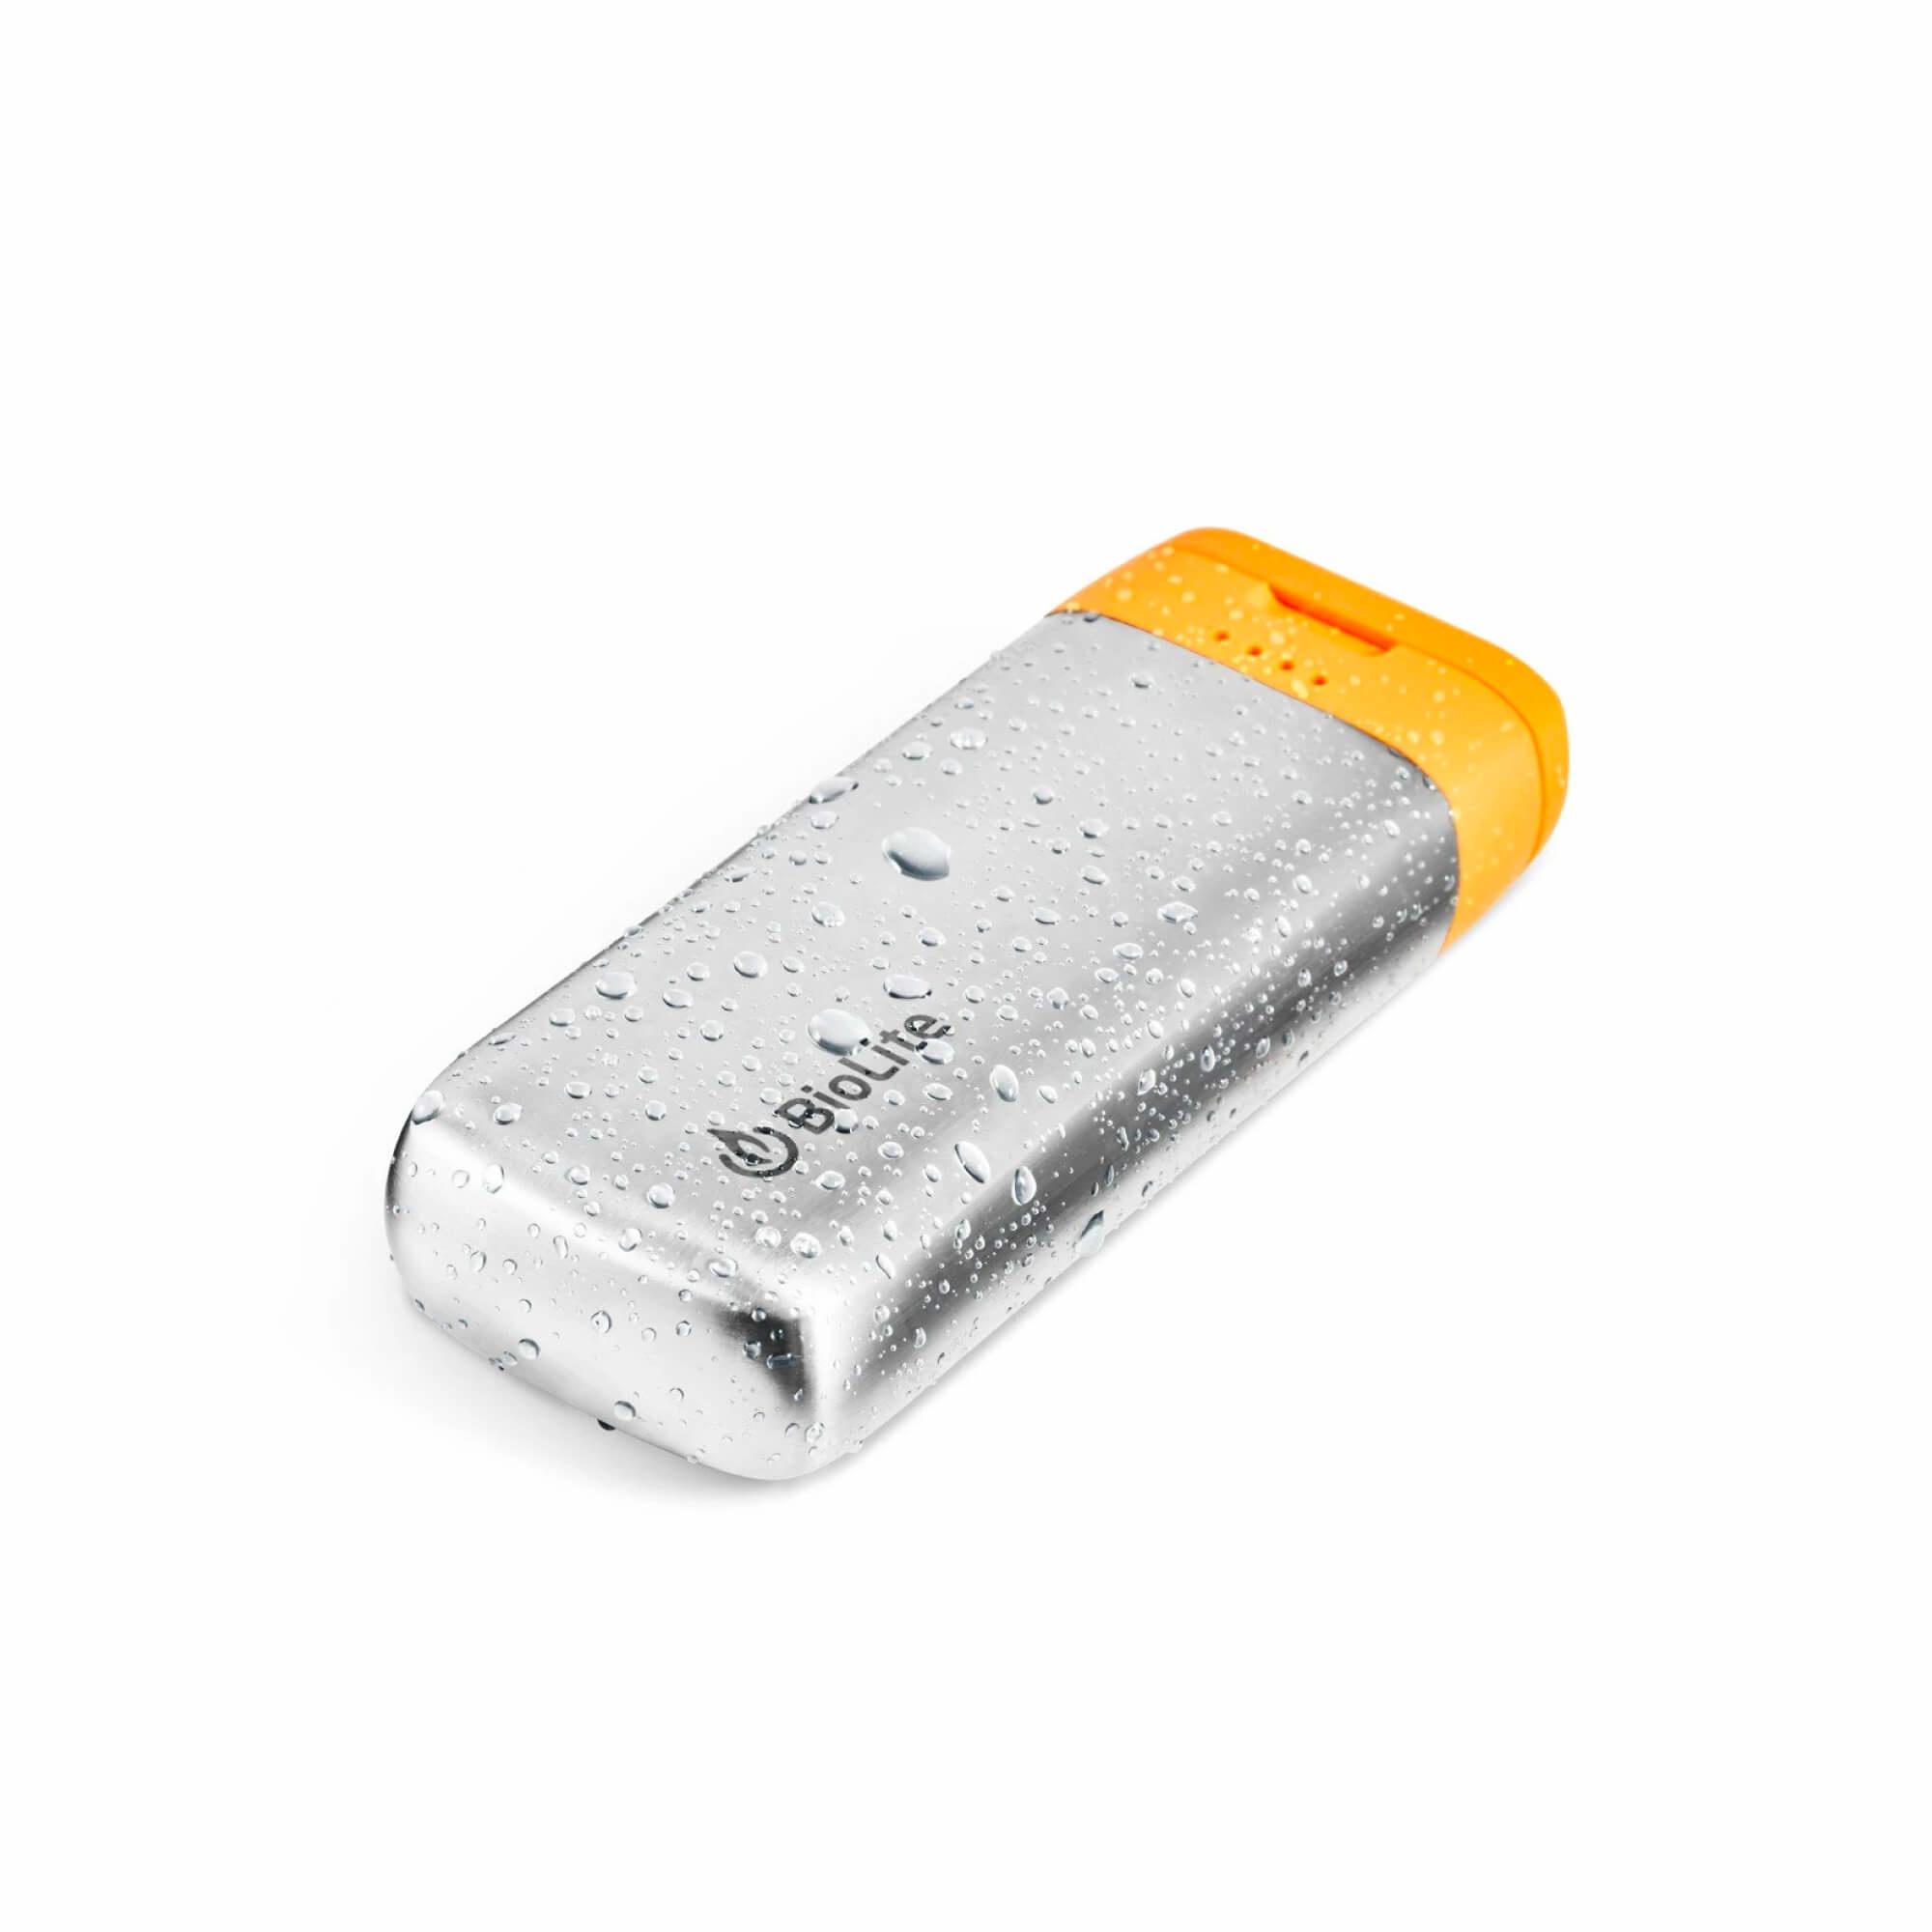 BioLite Charge USB Power Pack-6